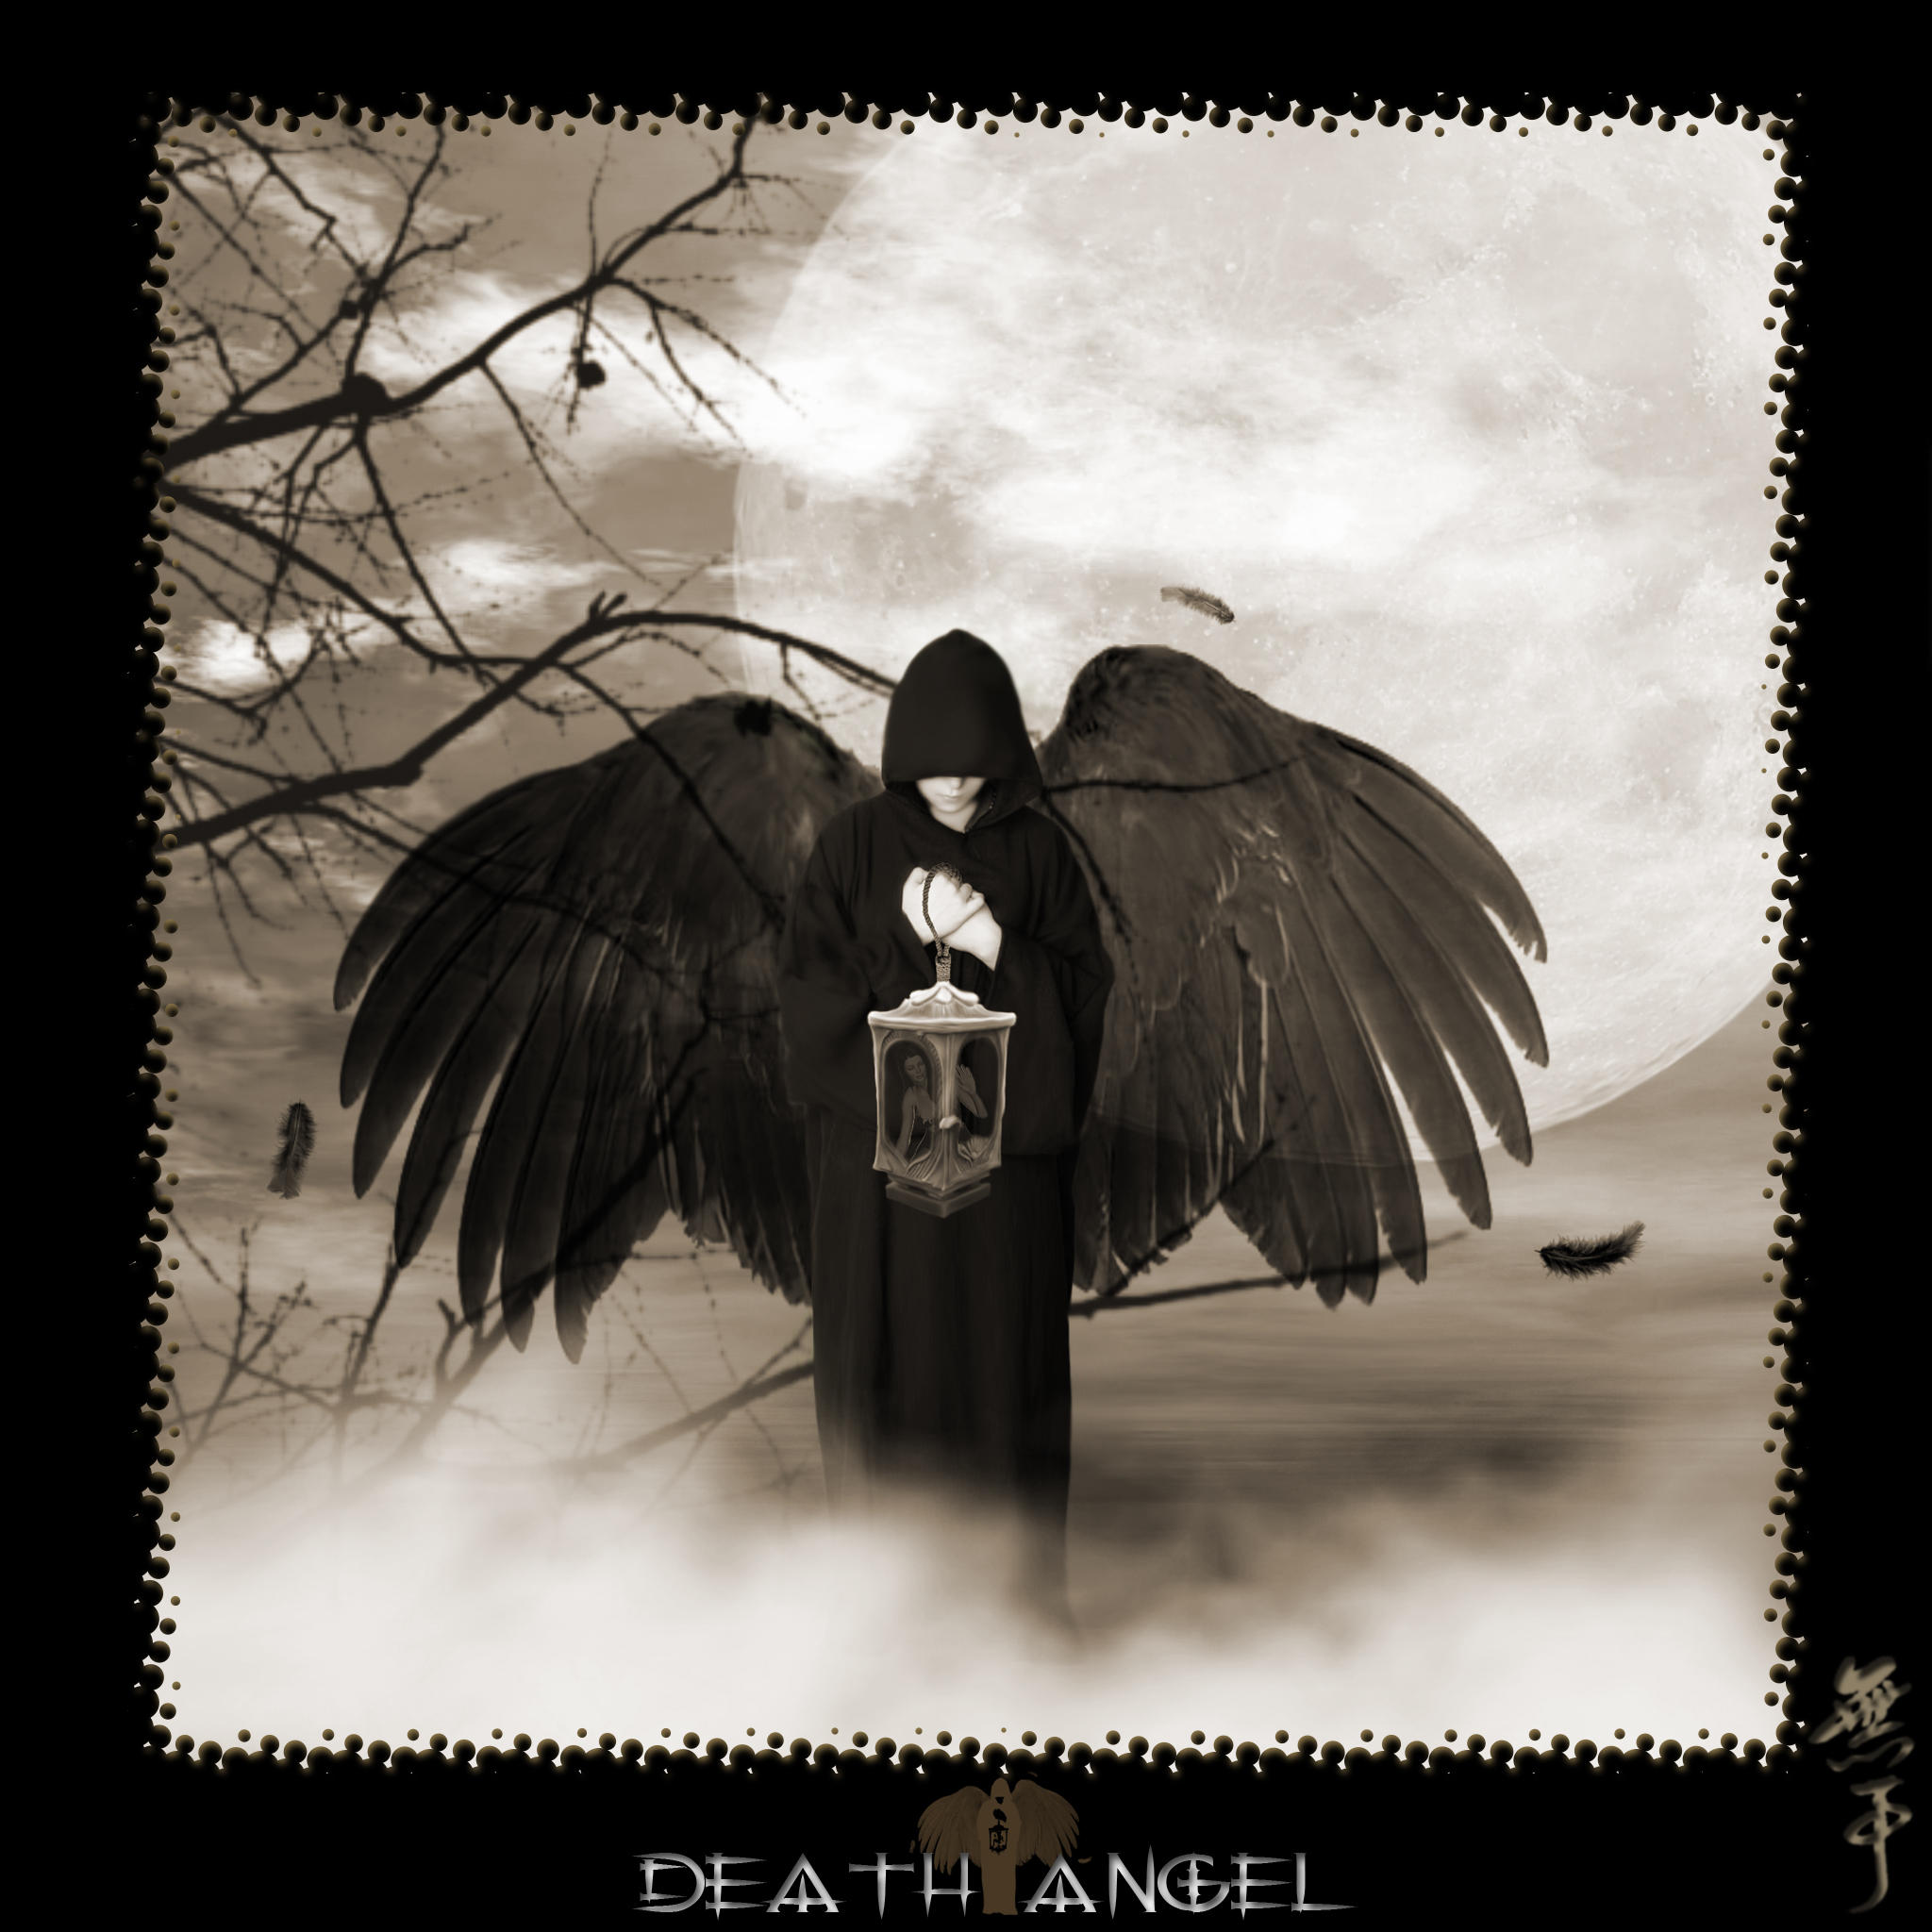 Death Angel by JaquelineMoreno